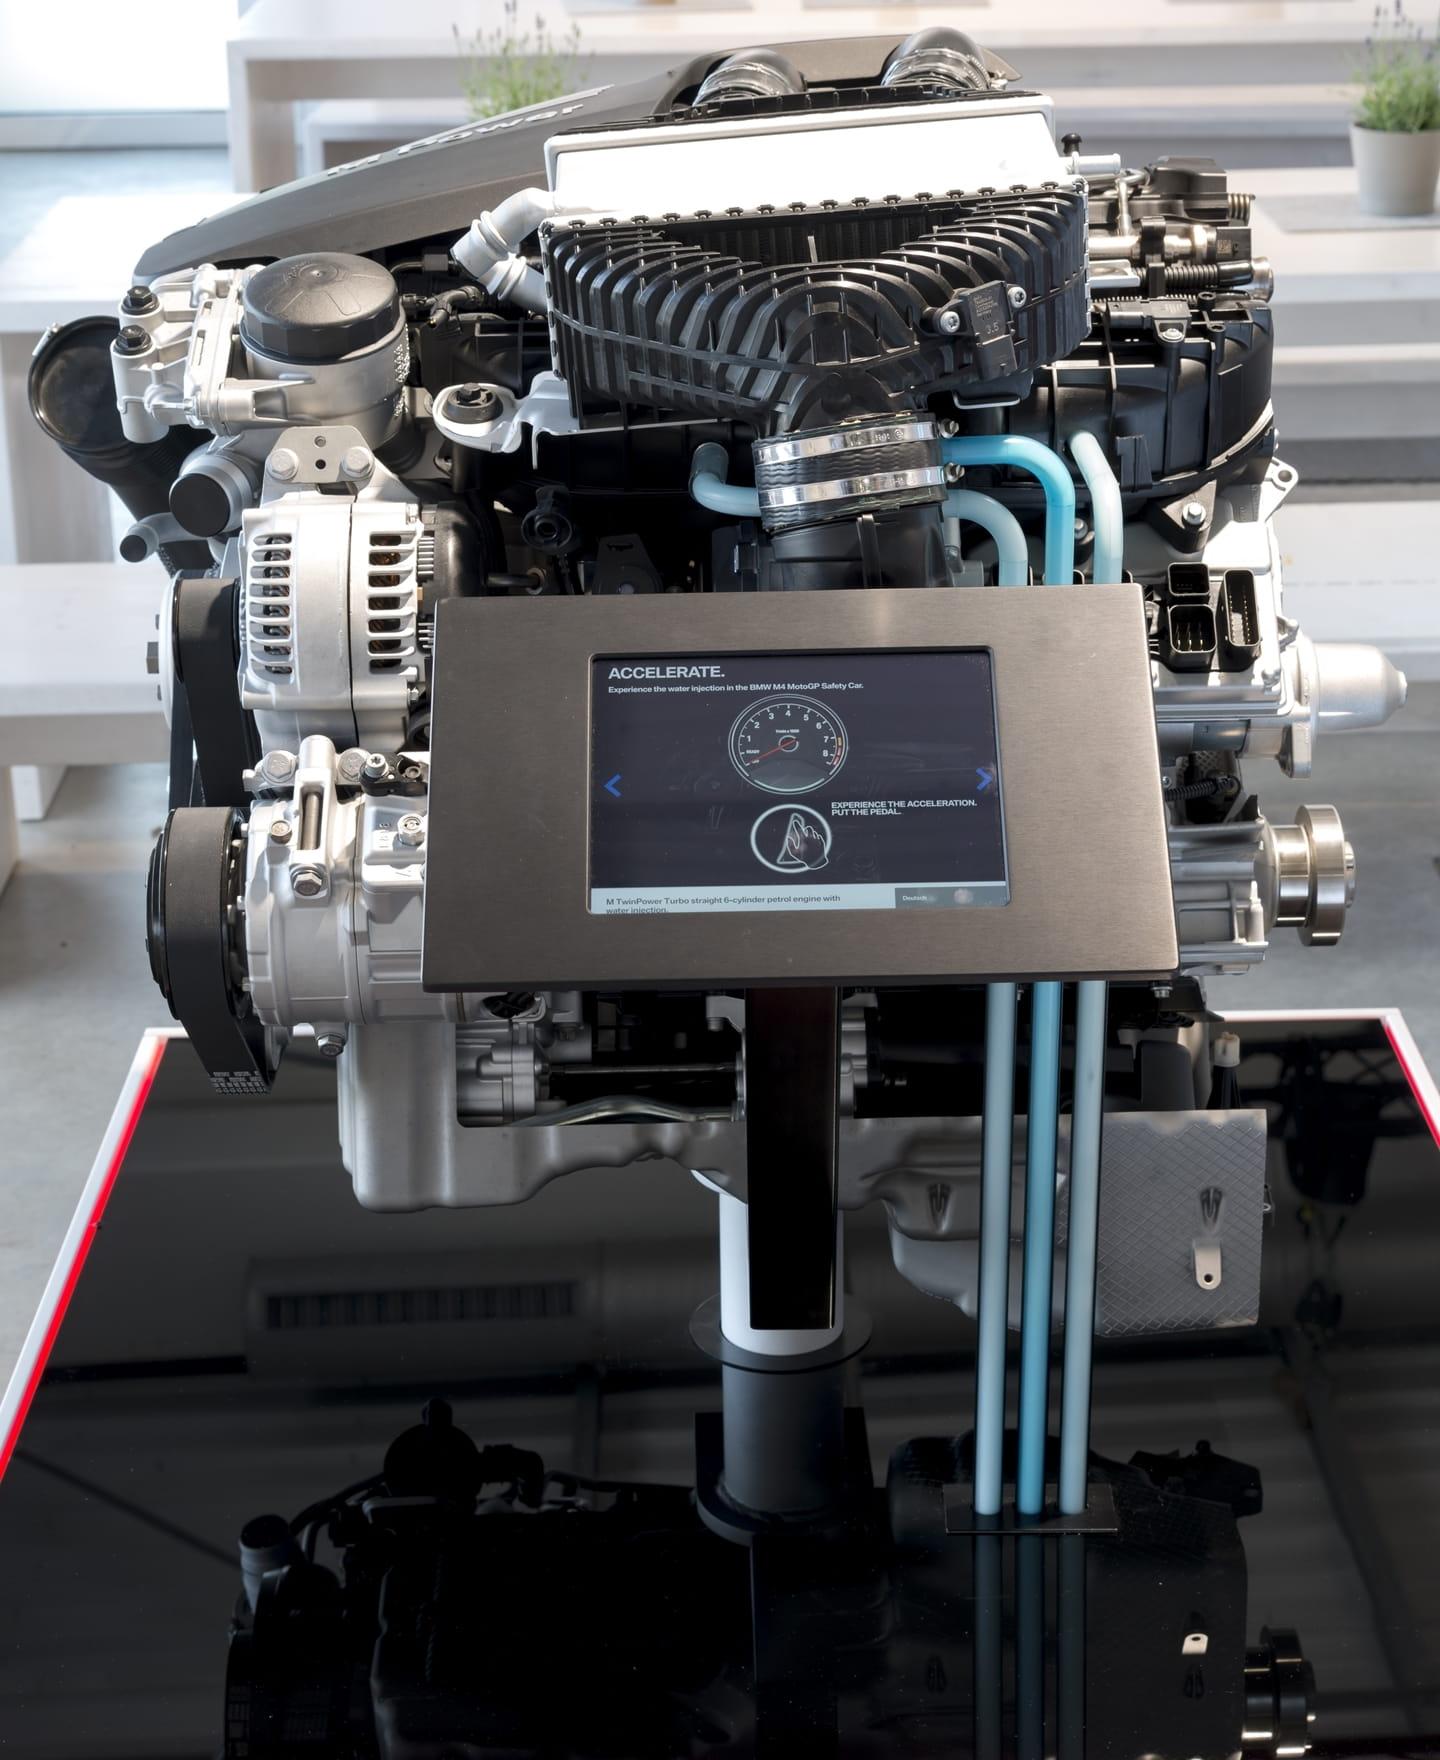 El motor el fiat kroma 2.0 gasolina